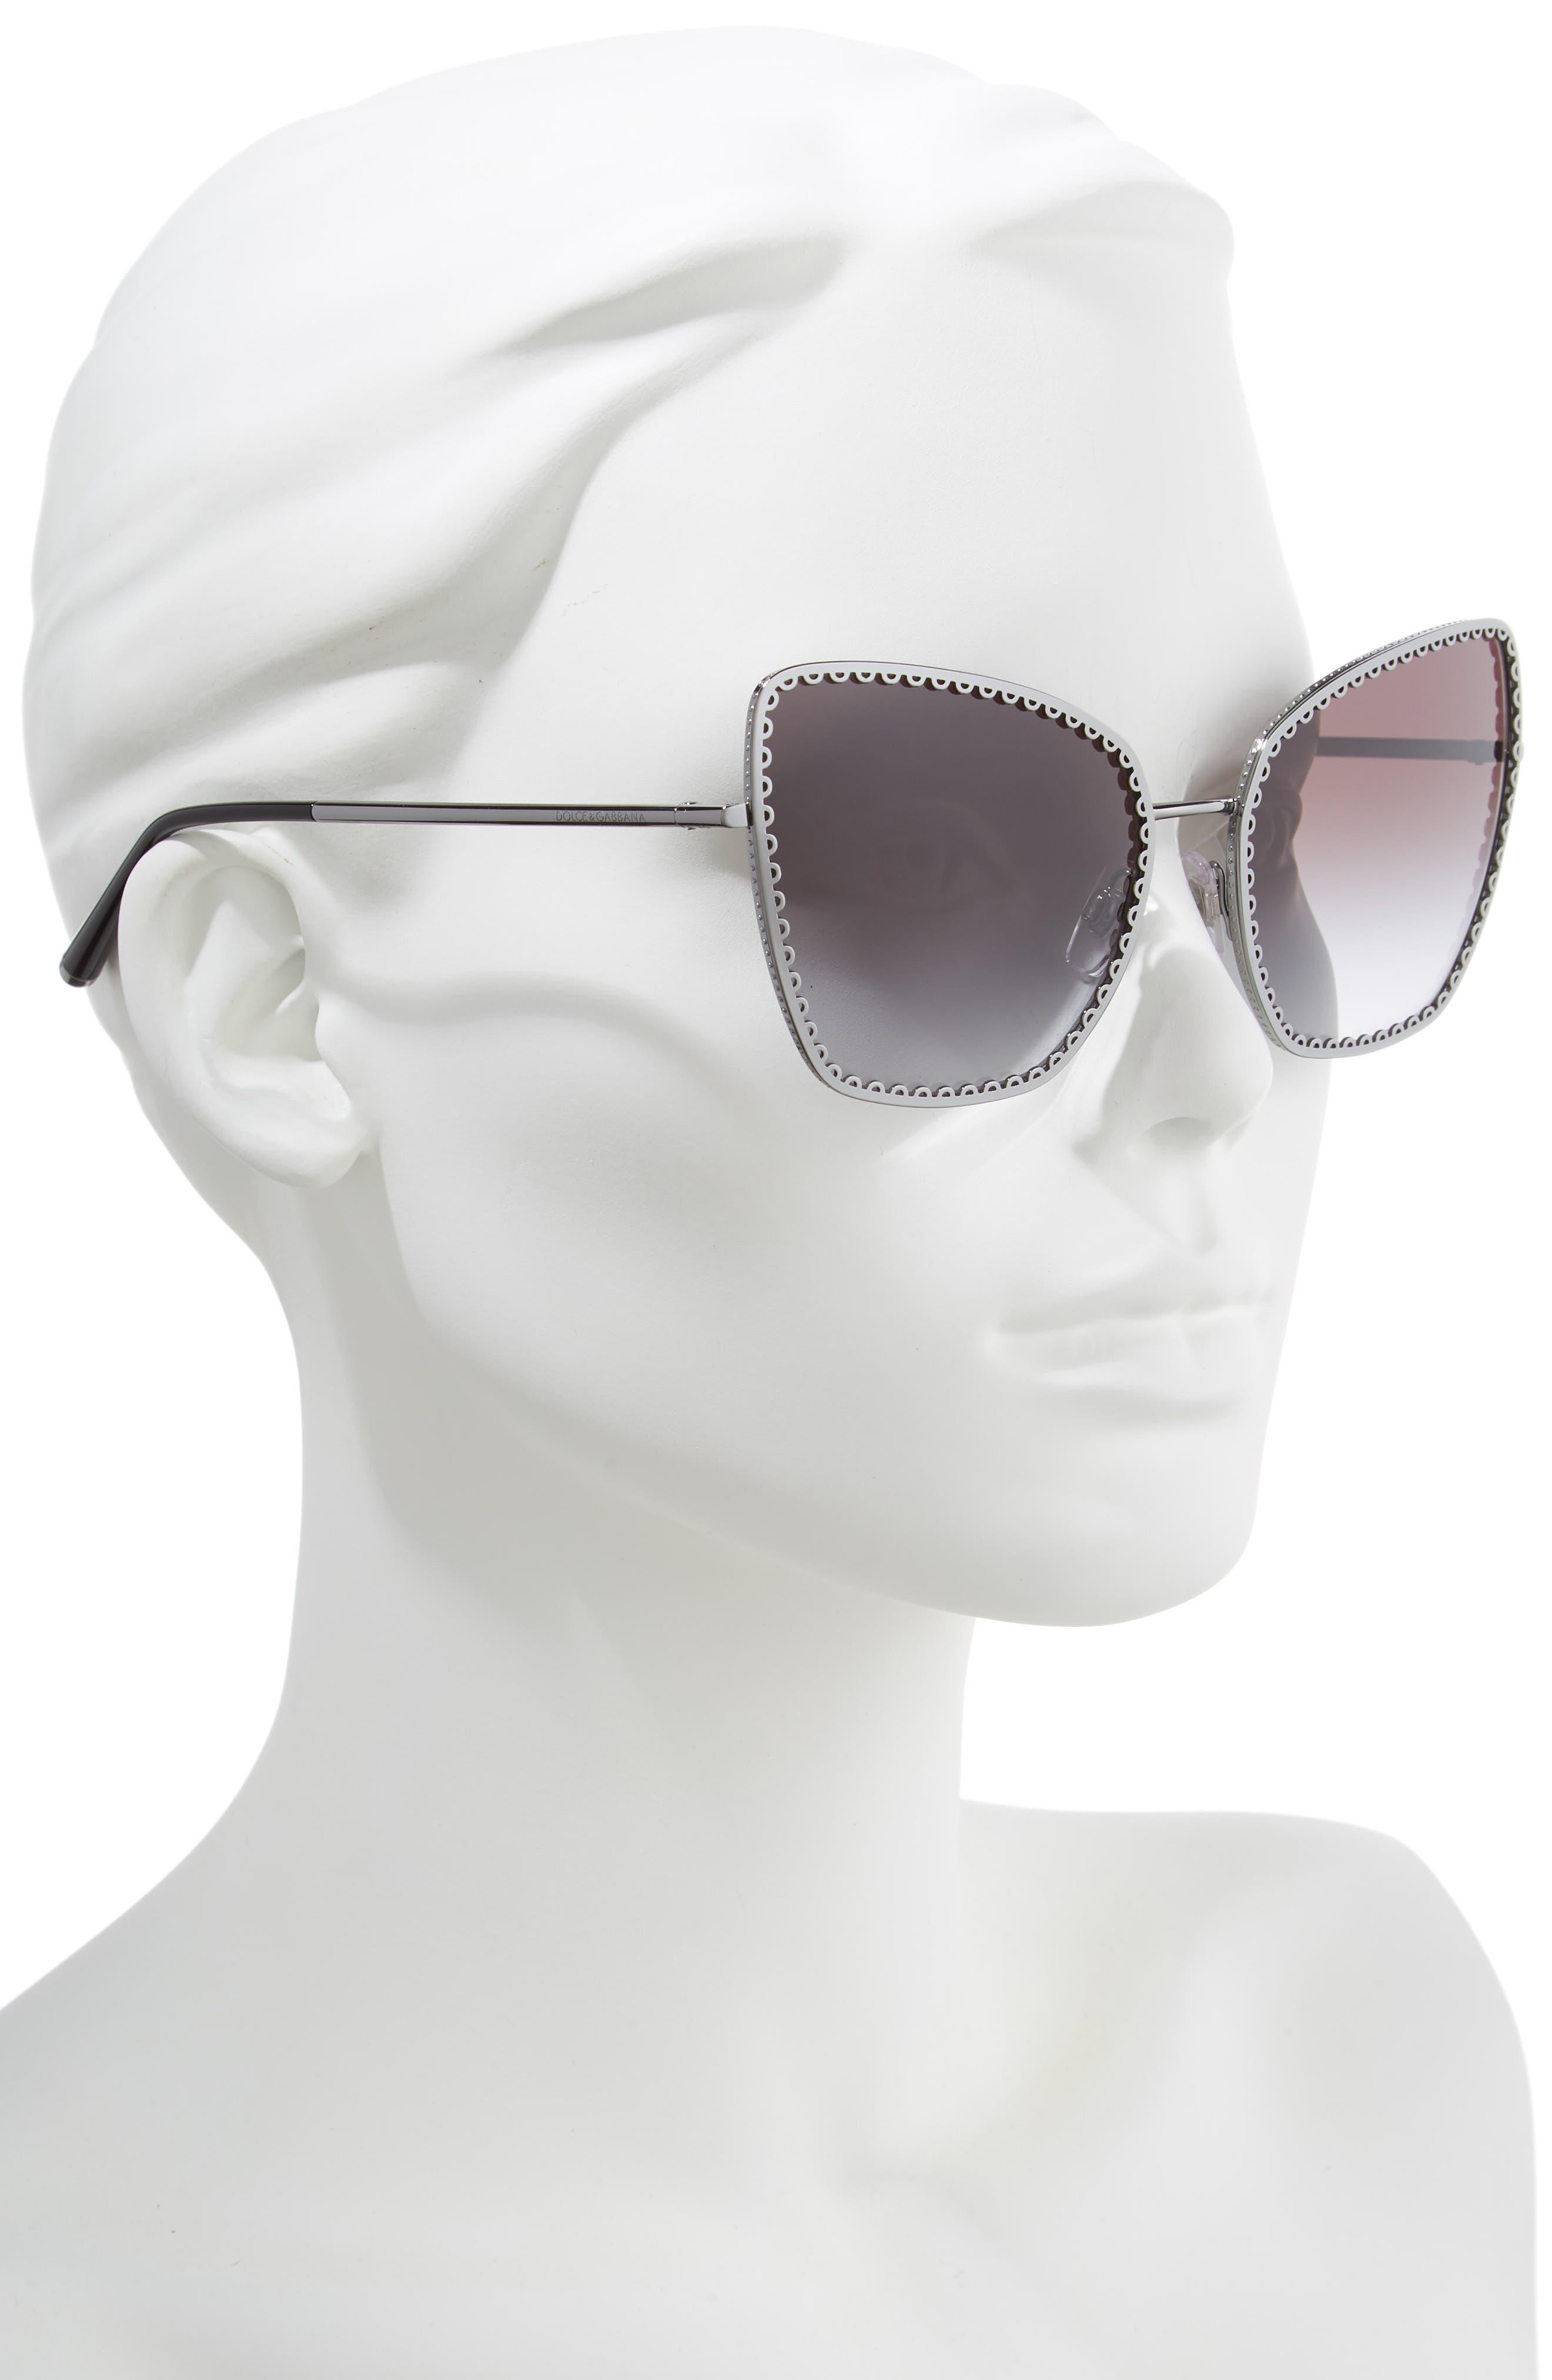 3b7a4802235 Dolce   Gabbana Women s Accessories